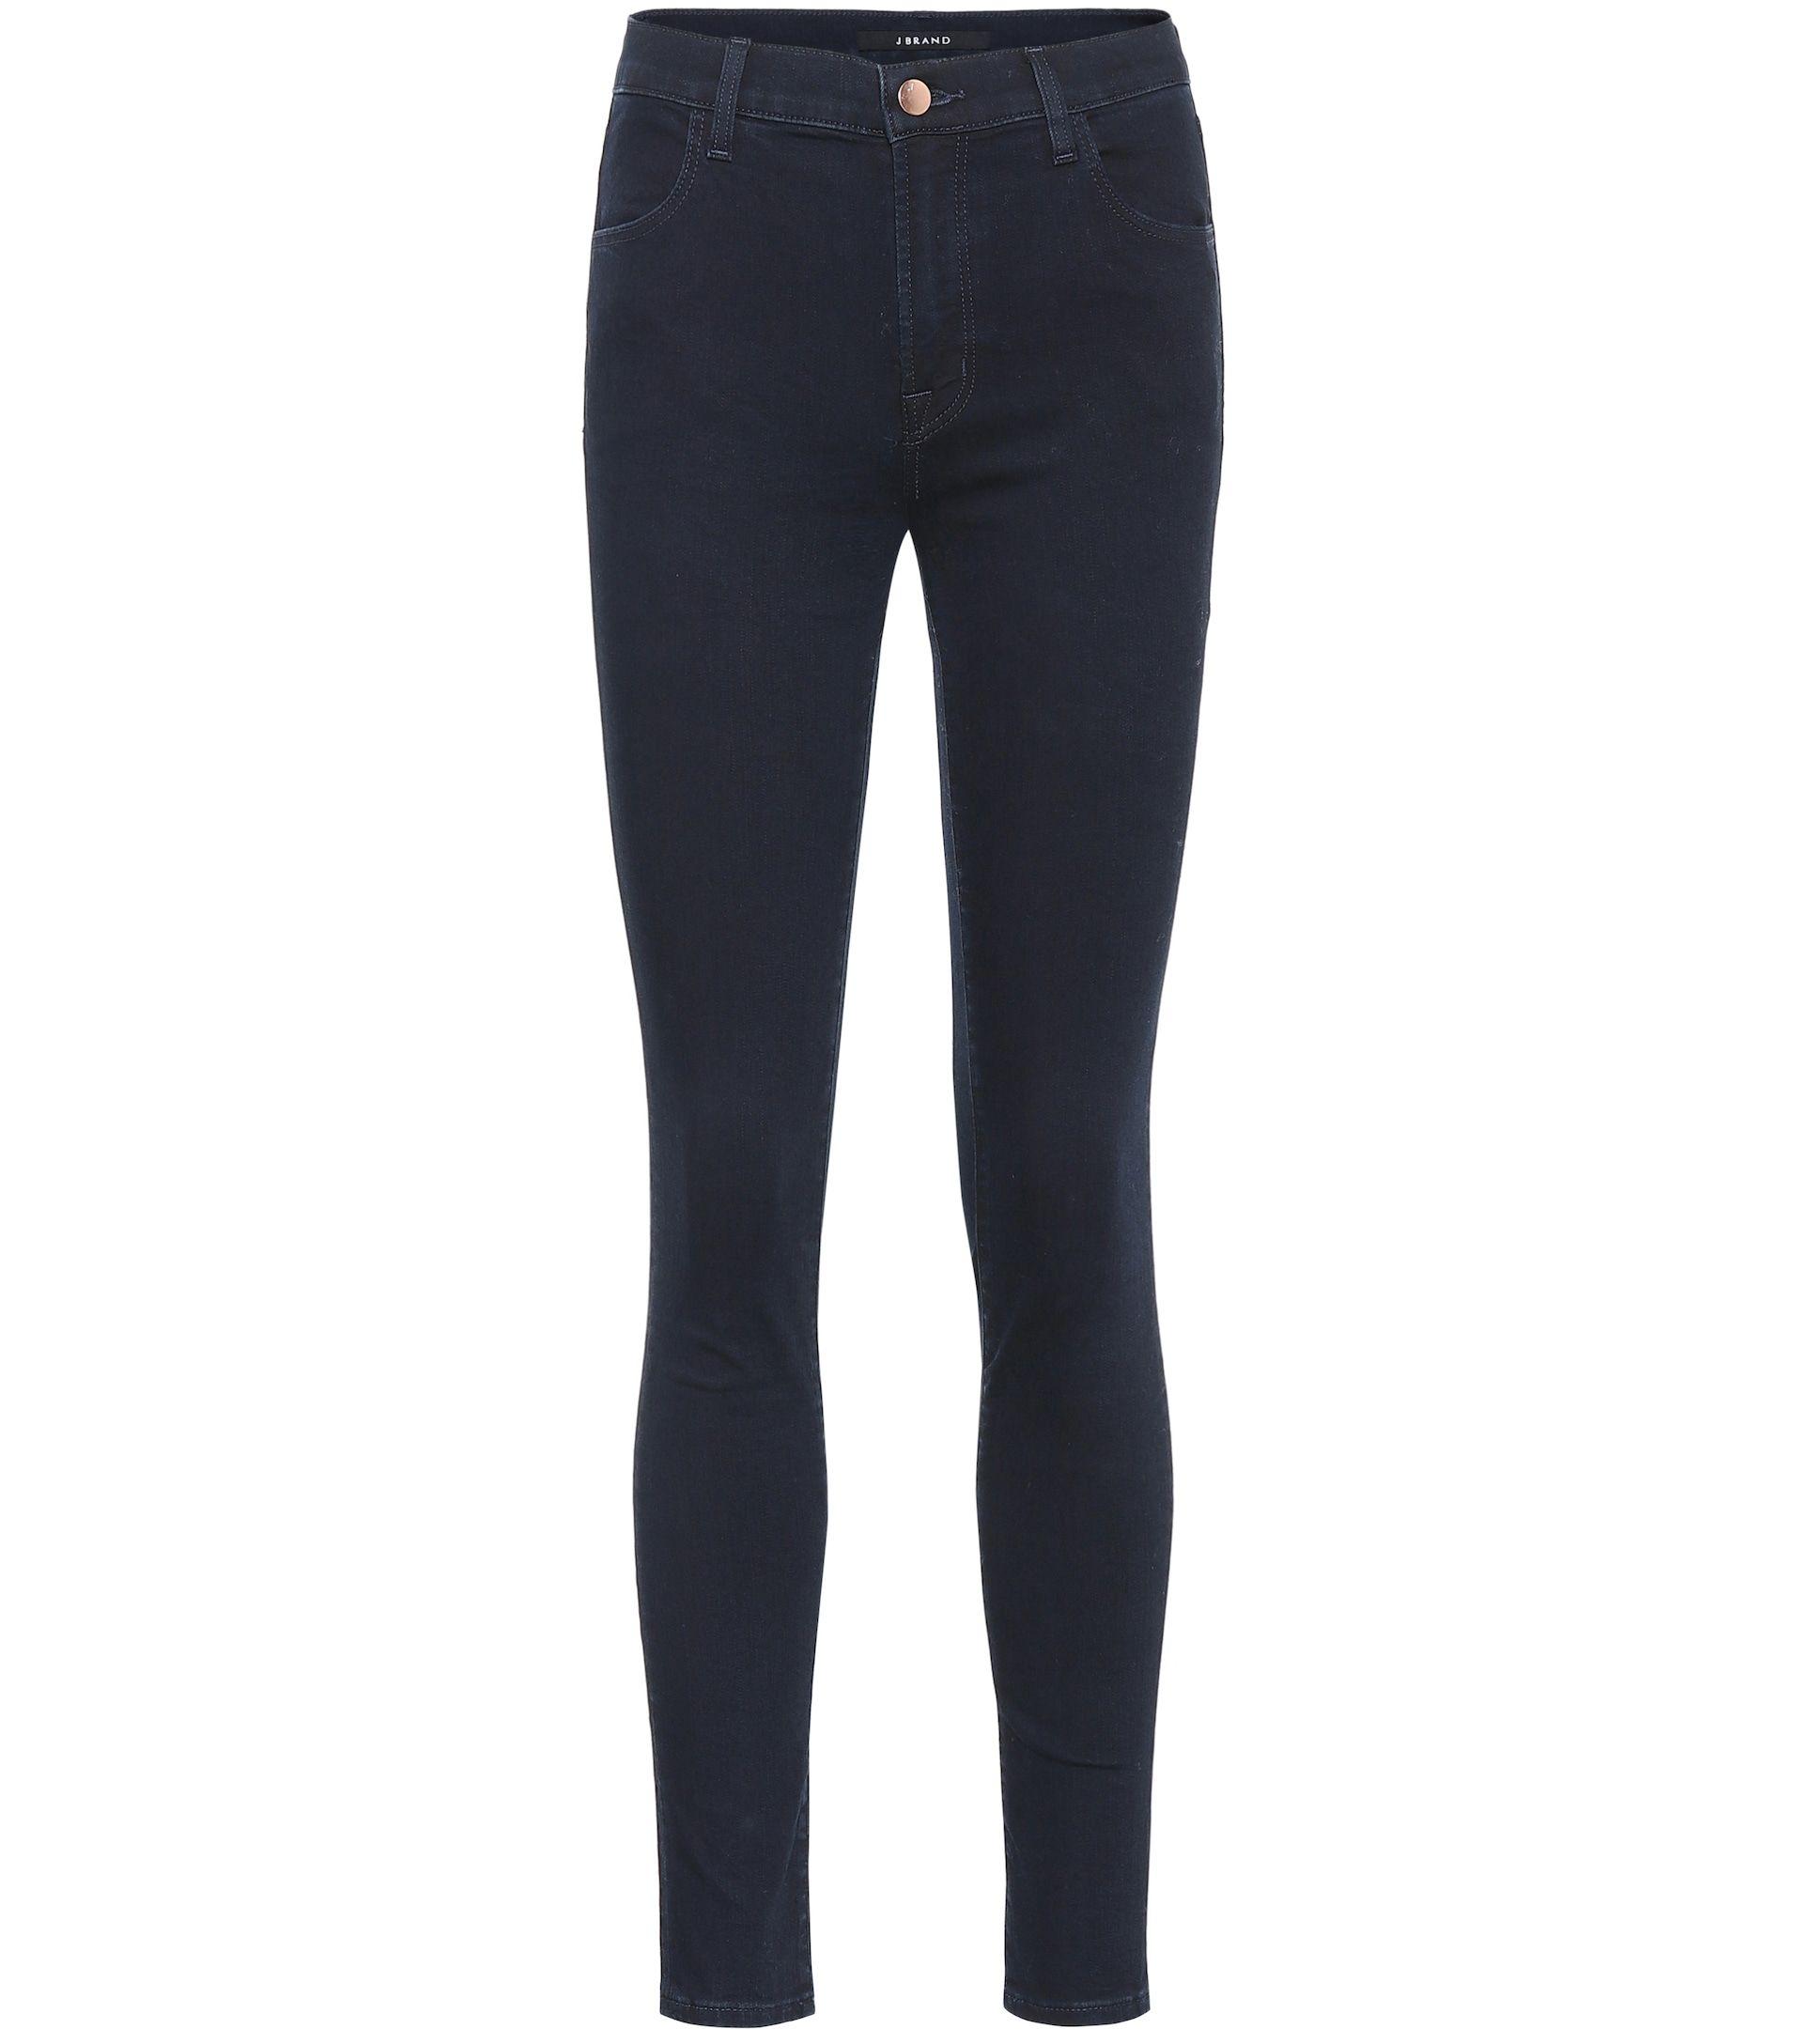 Maria high-rise skinny jeans #skinnyjeansandankleboots